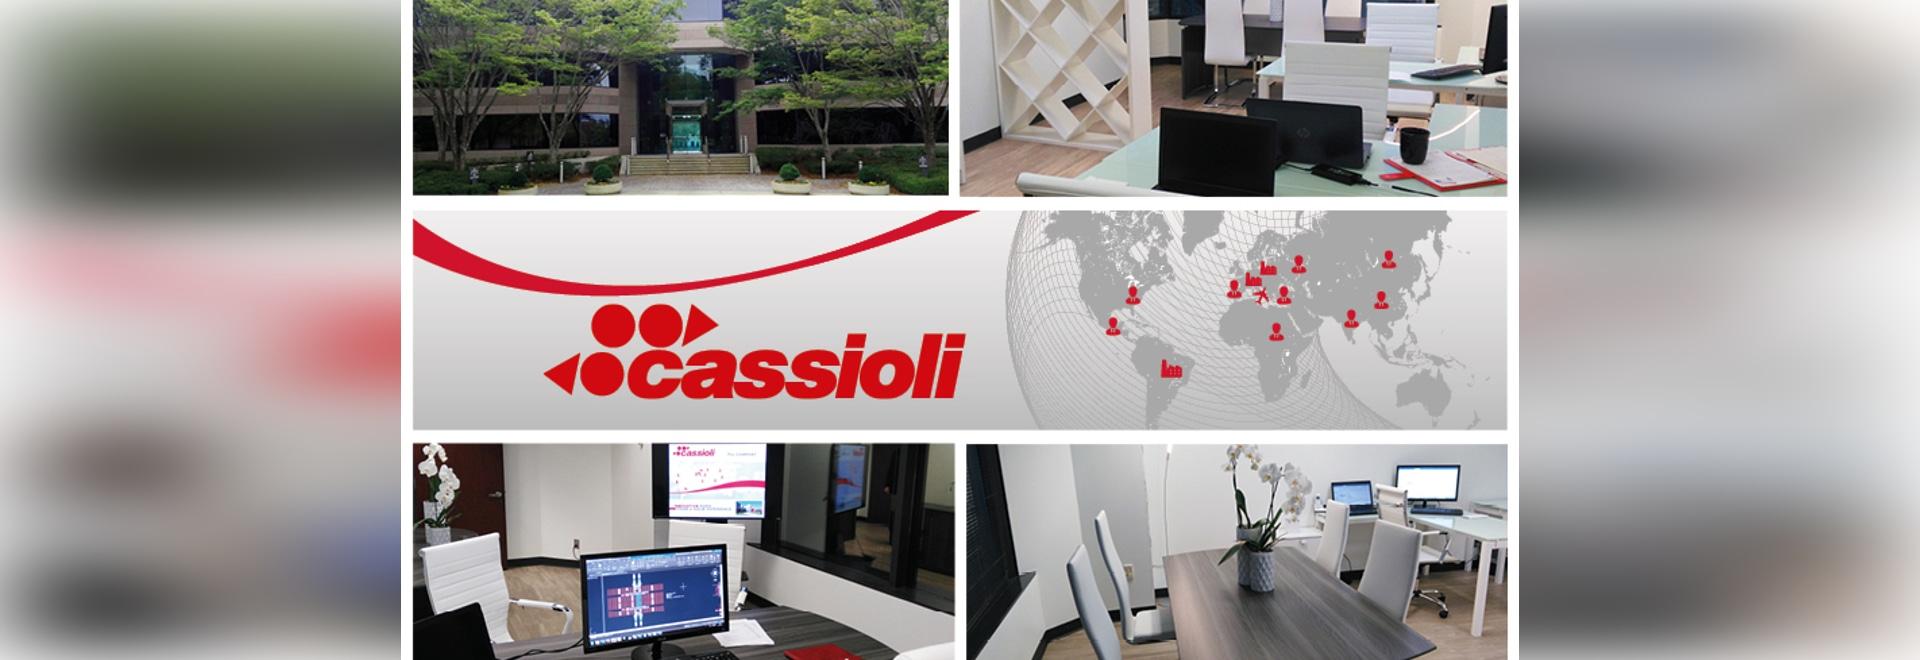 CASSIOLI USA Corp: a new CASSIOLI's head office for North America in Alabama